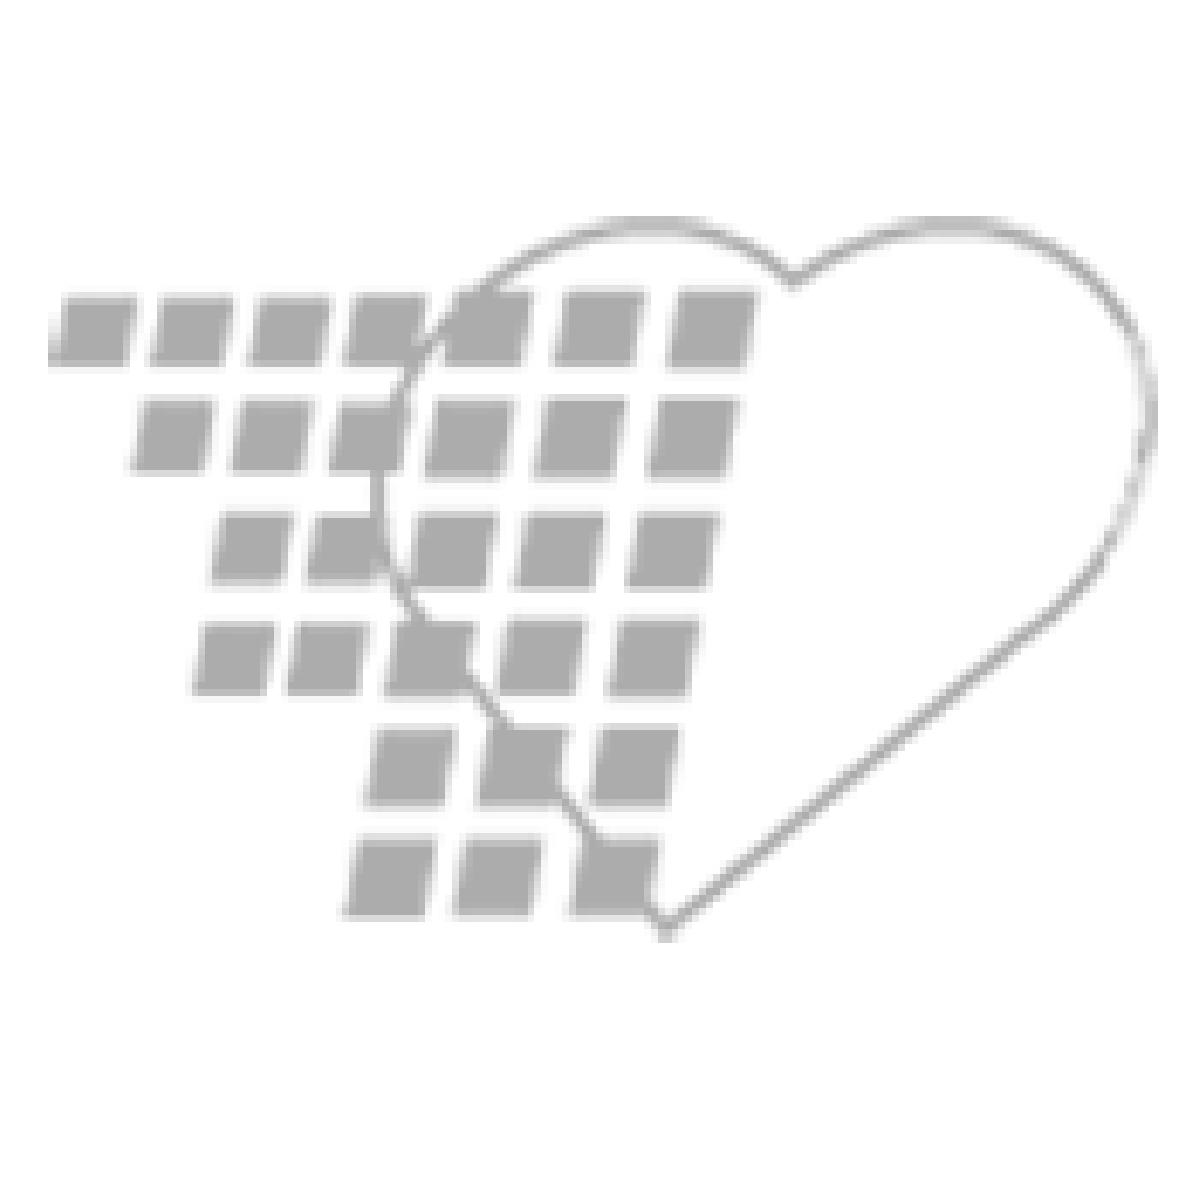 06-93-1060-500ML - Demo Dose® 0.45% NaCl IV Fluids 500mL